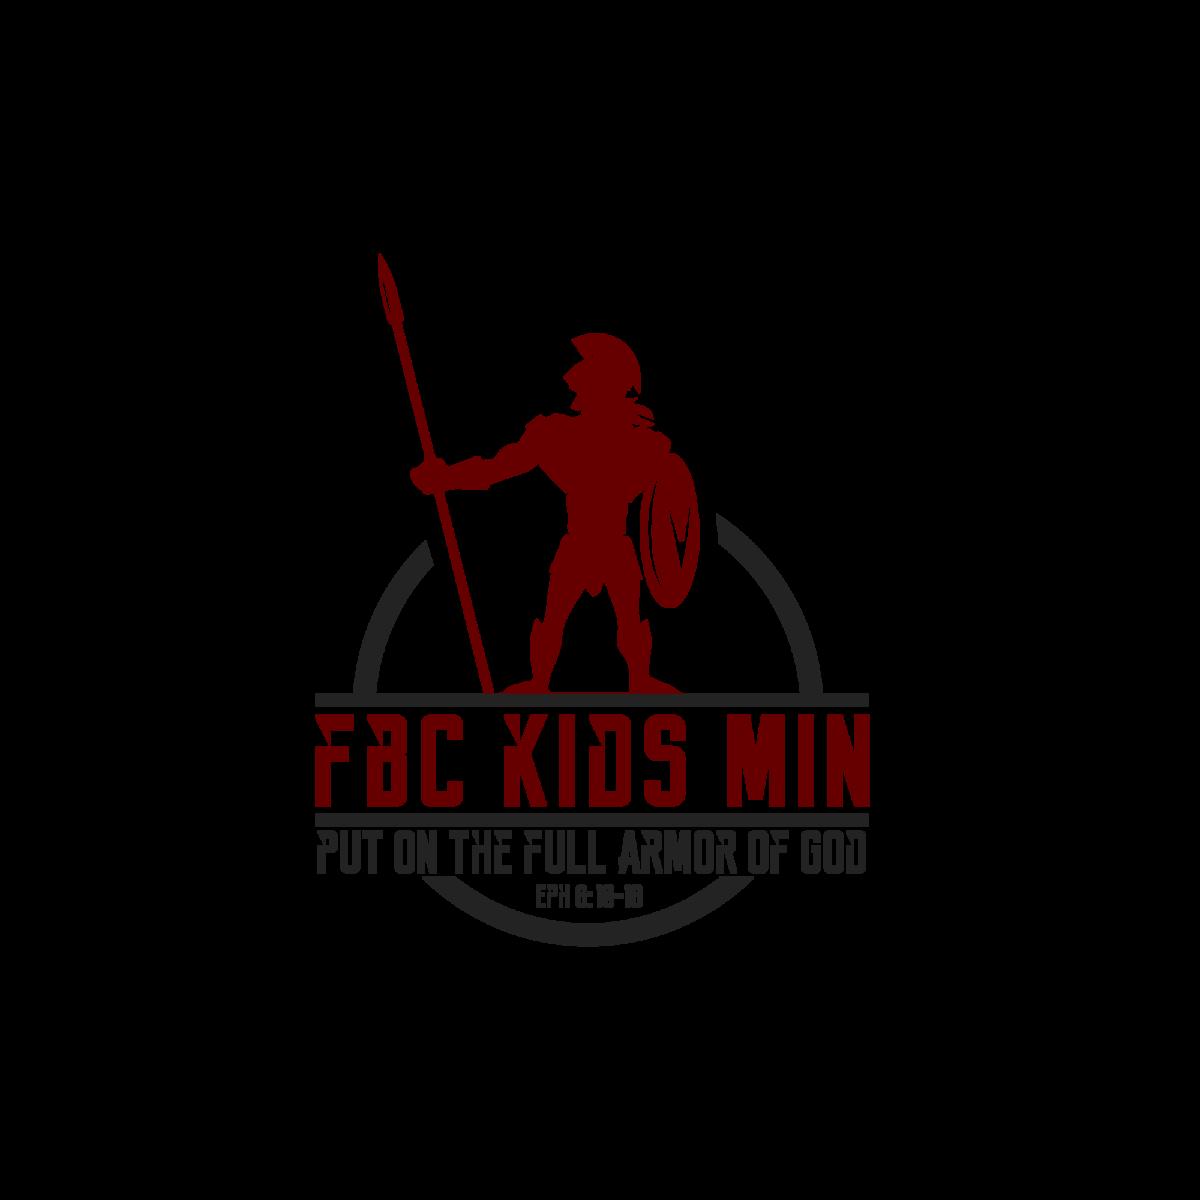 Kid's Min Logo